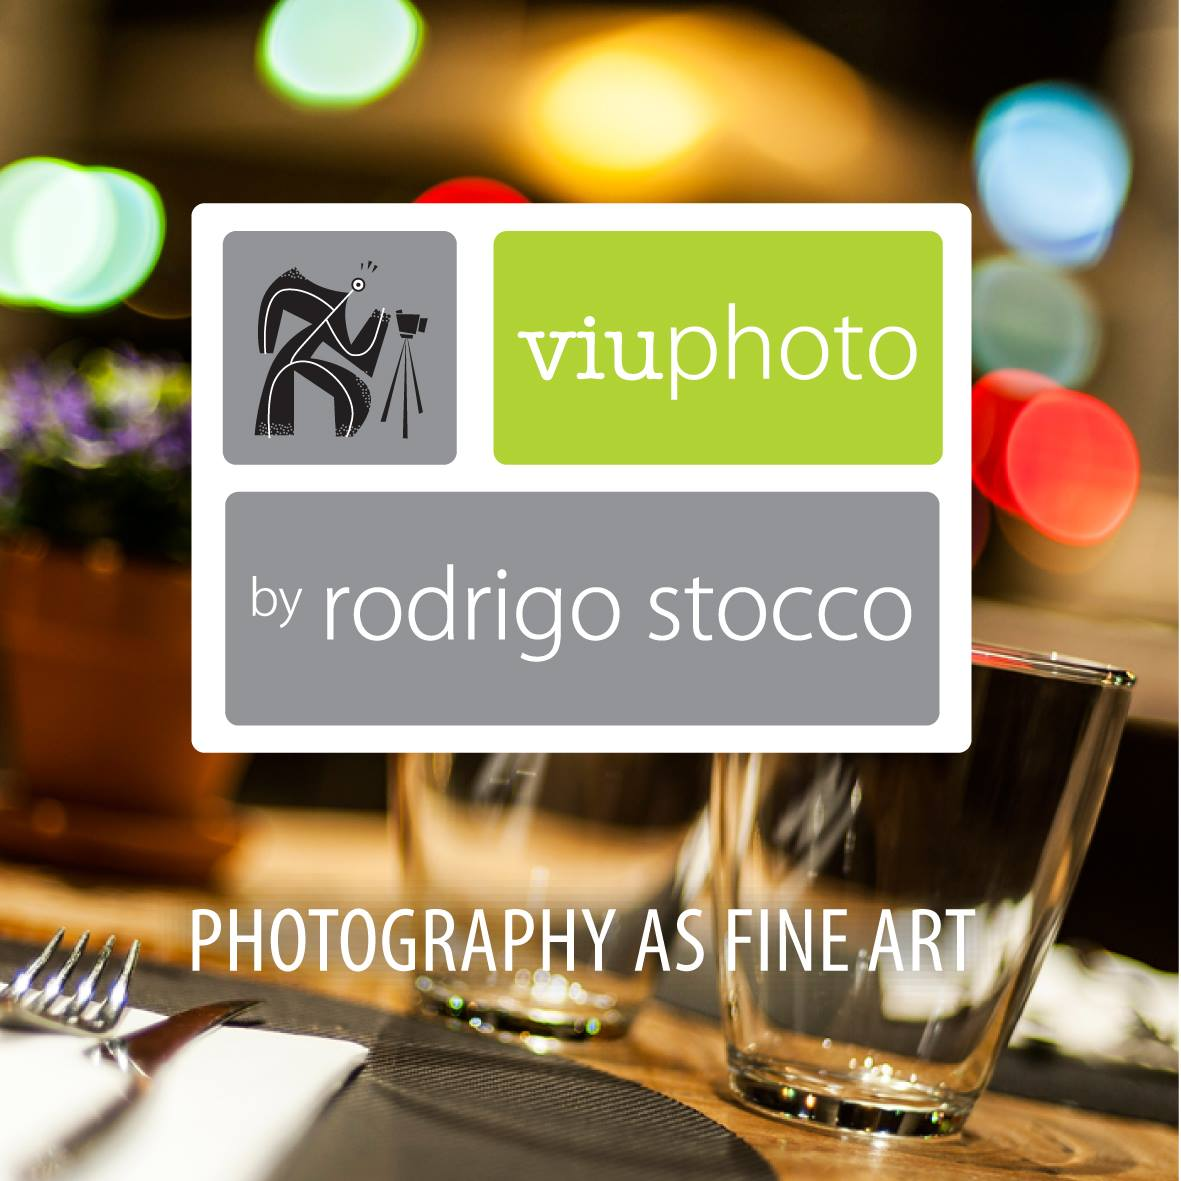 ViuPhoto Fotografía Profesional